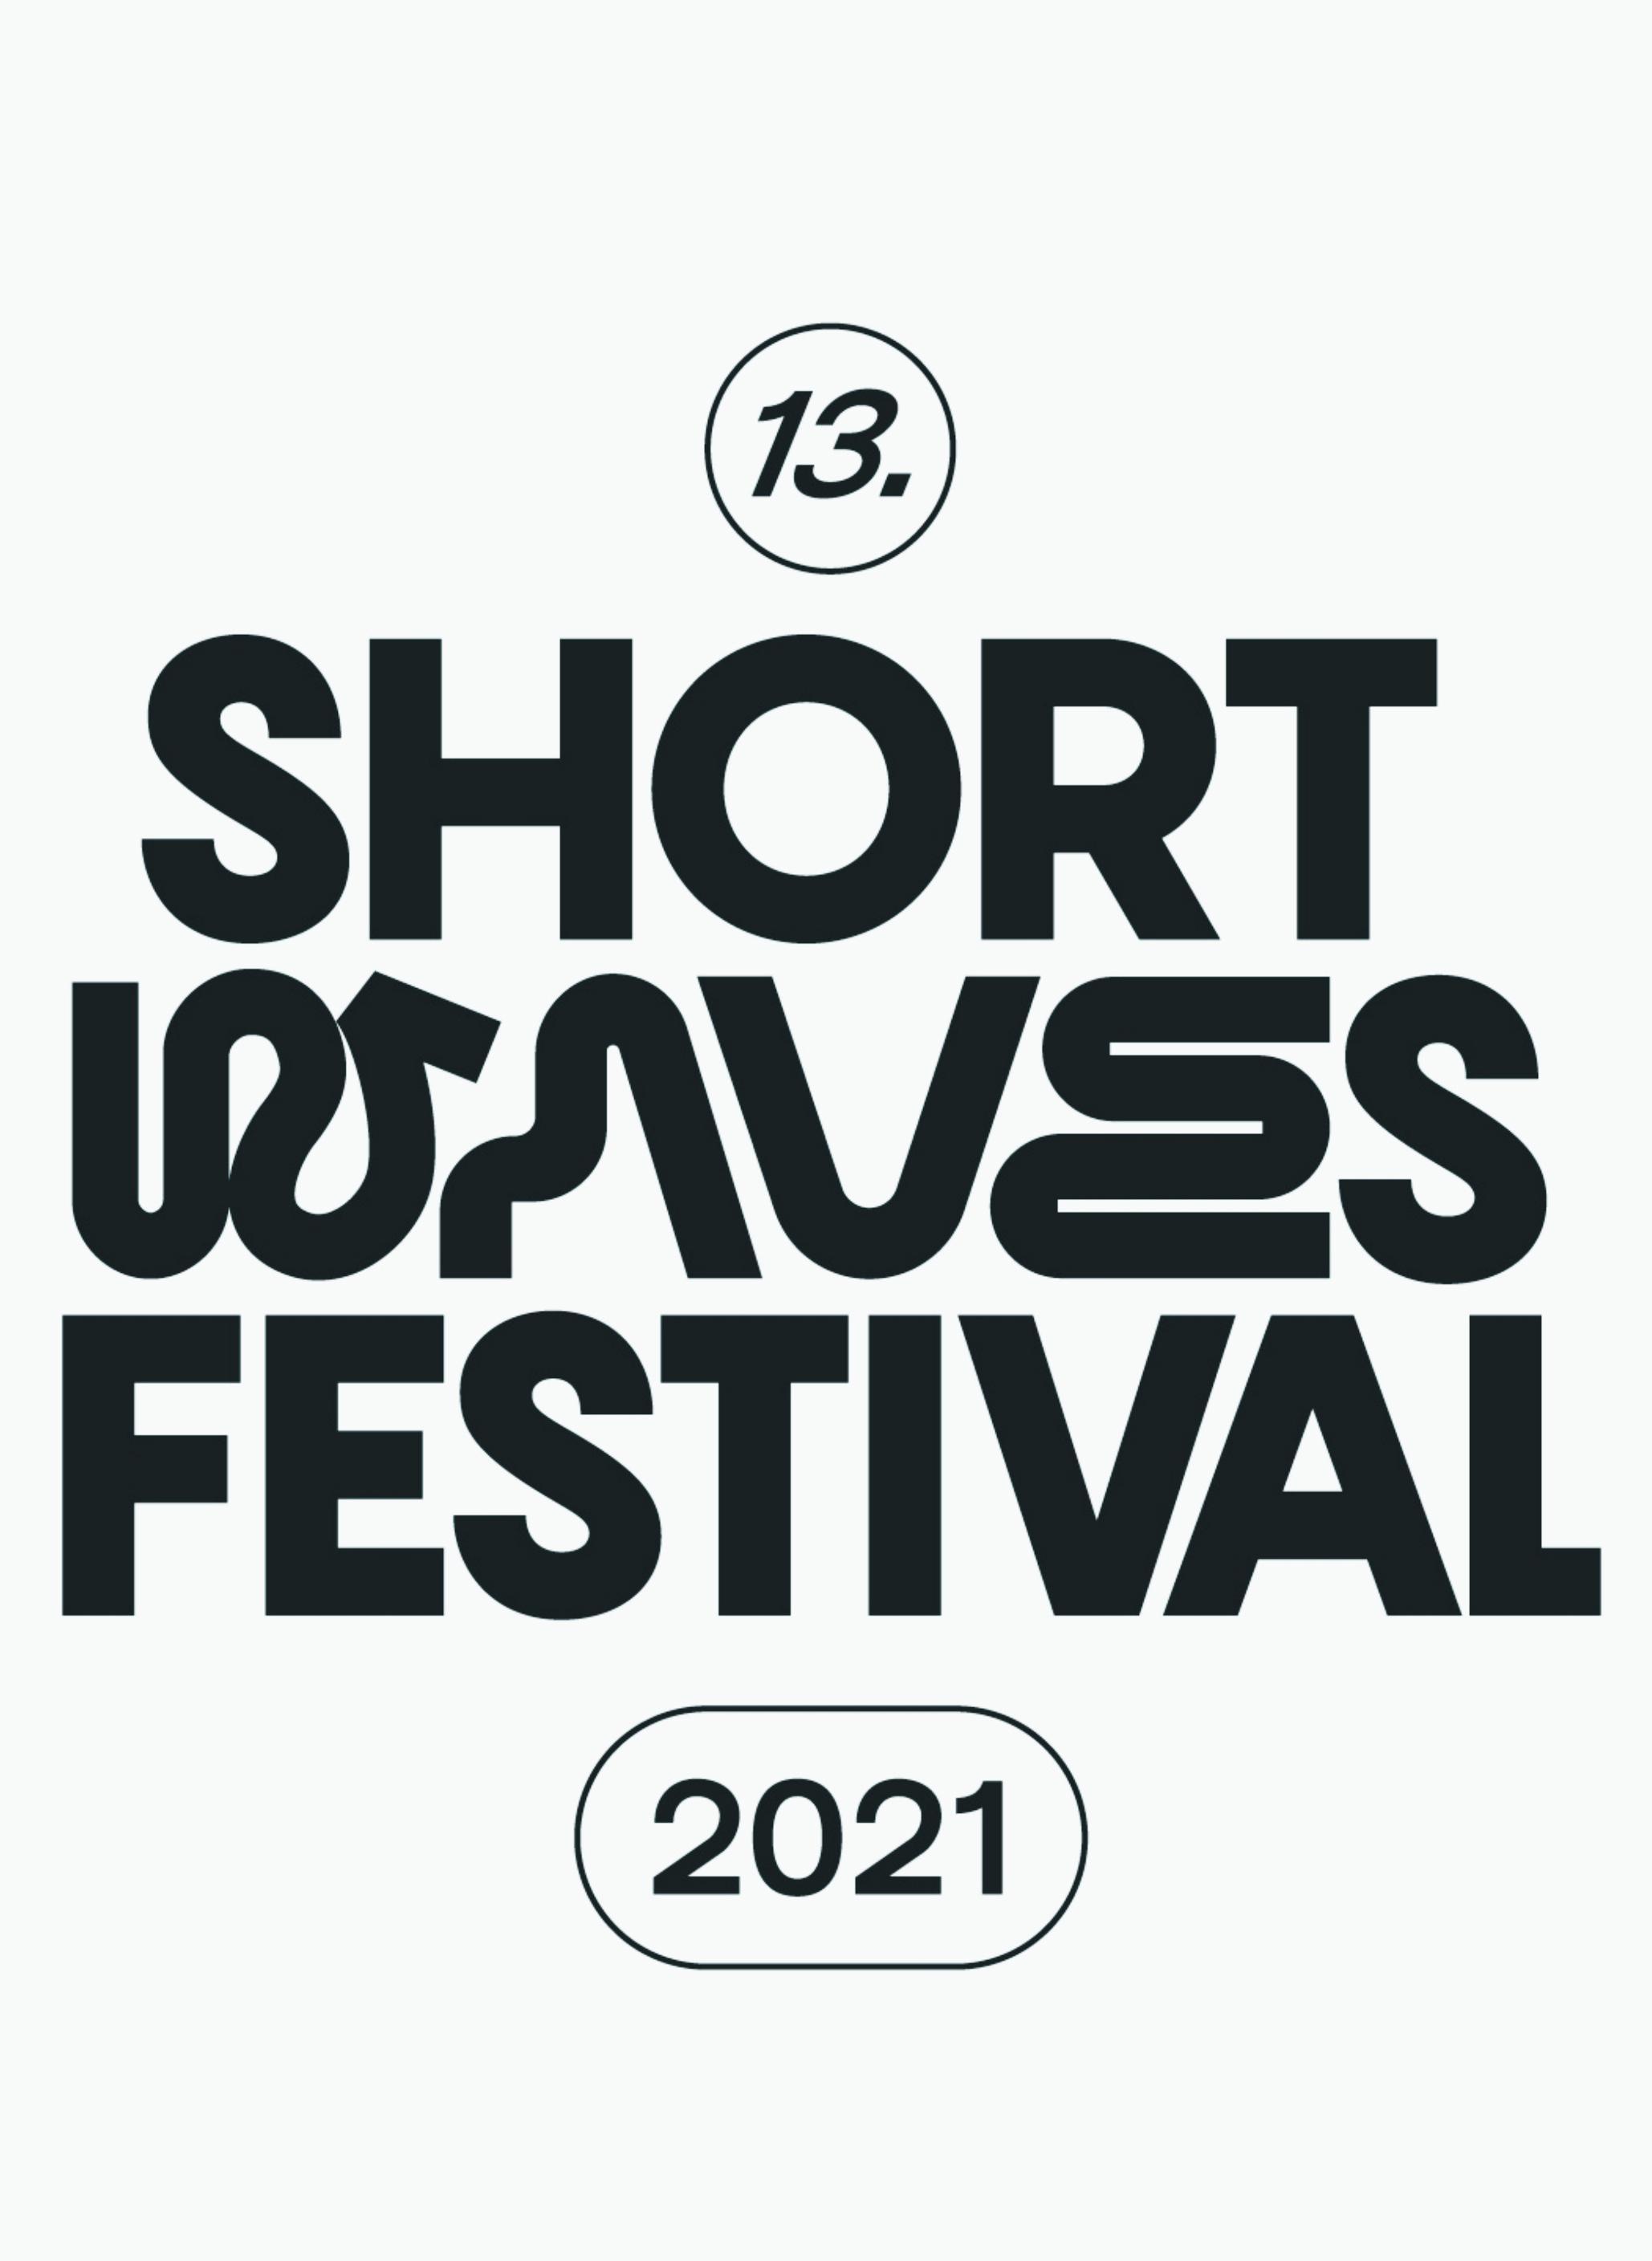 Short Waves Festival 2021 - Four Perspectives on Solidarity: Pokolenia!